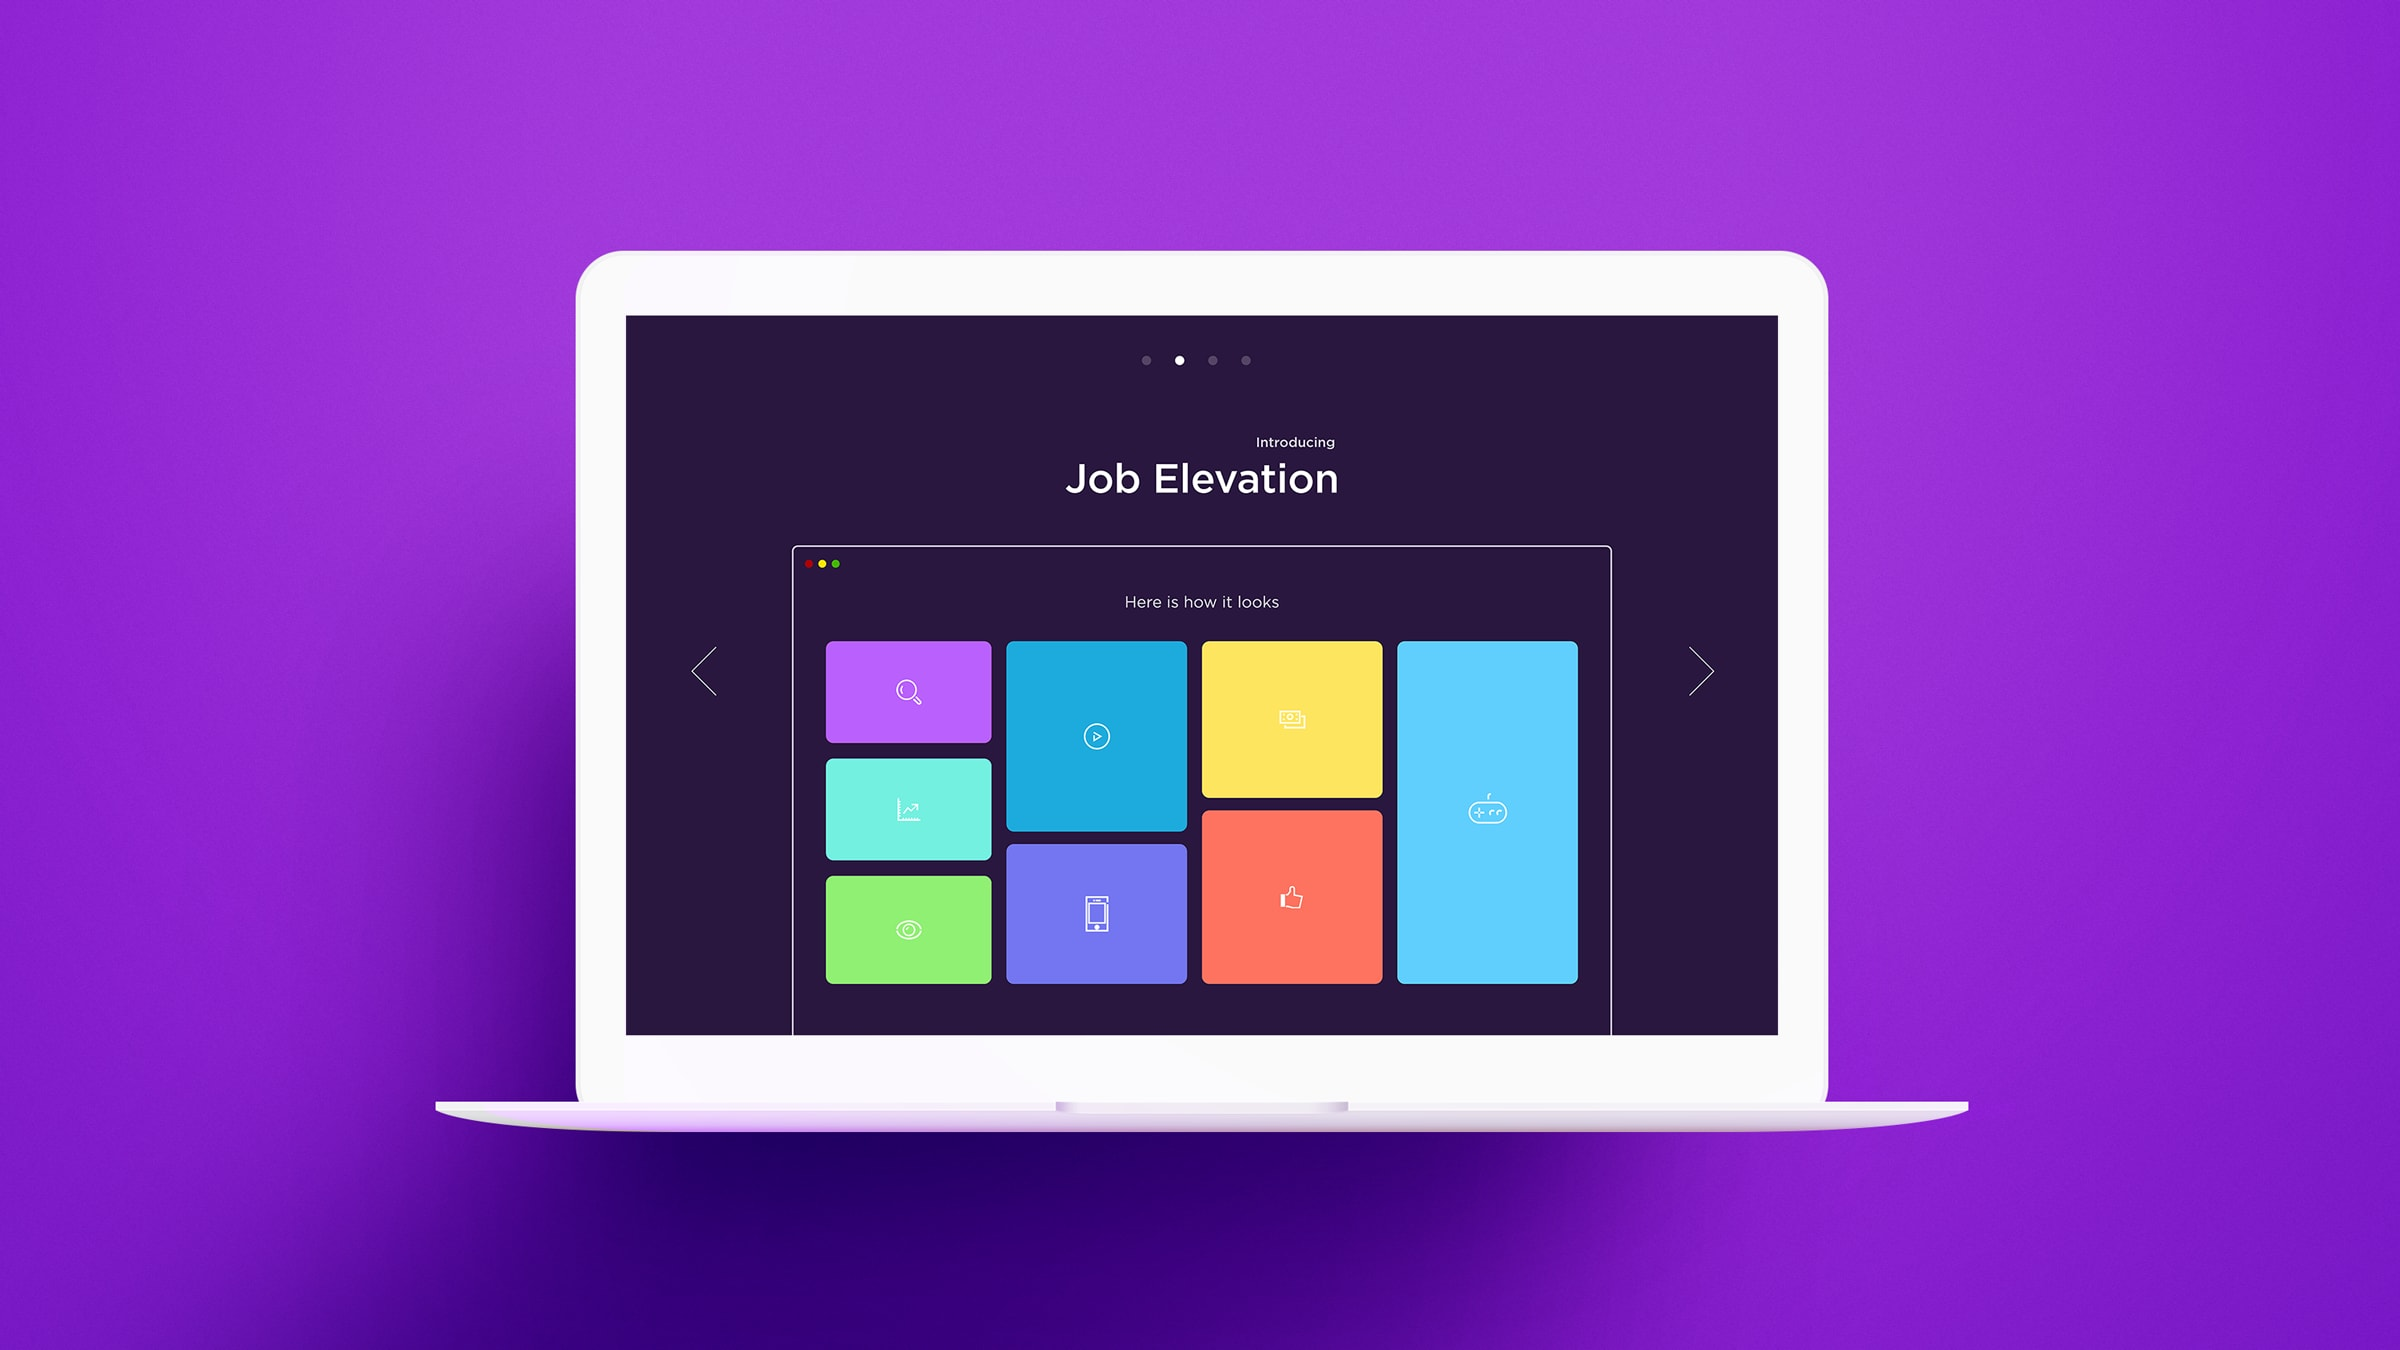 Job Elevation